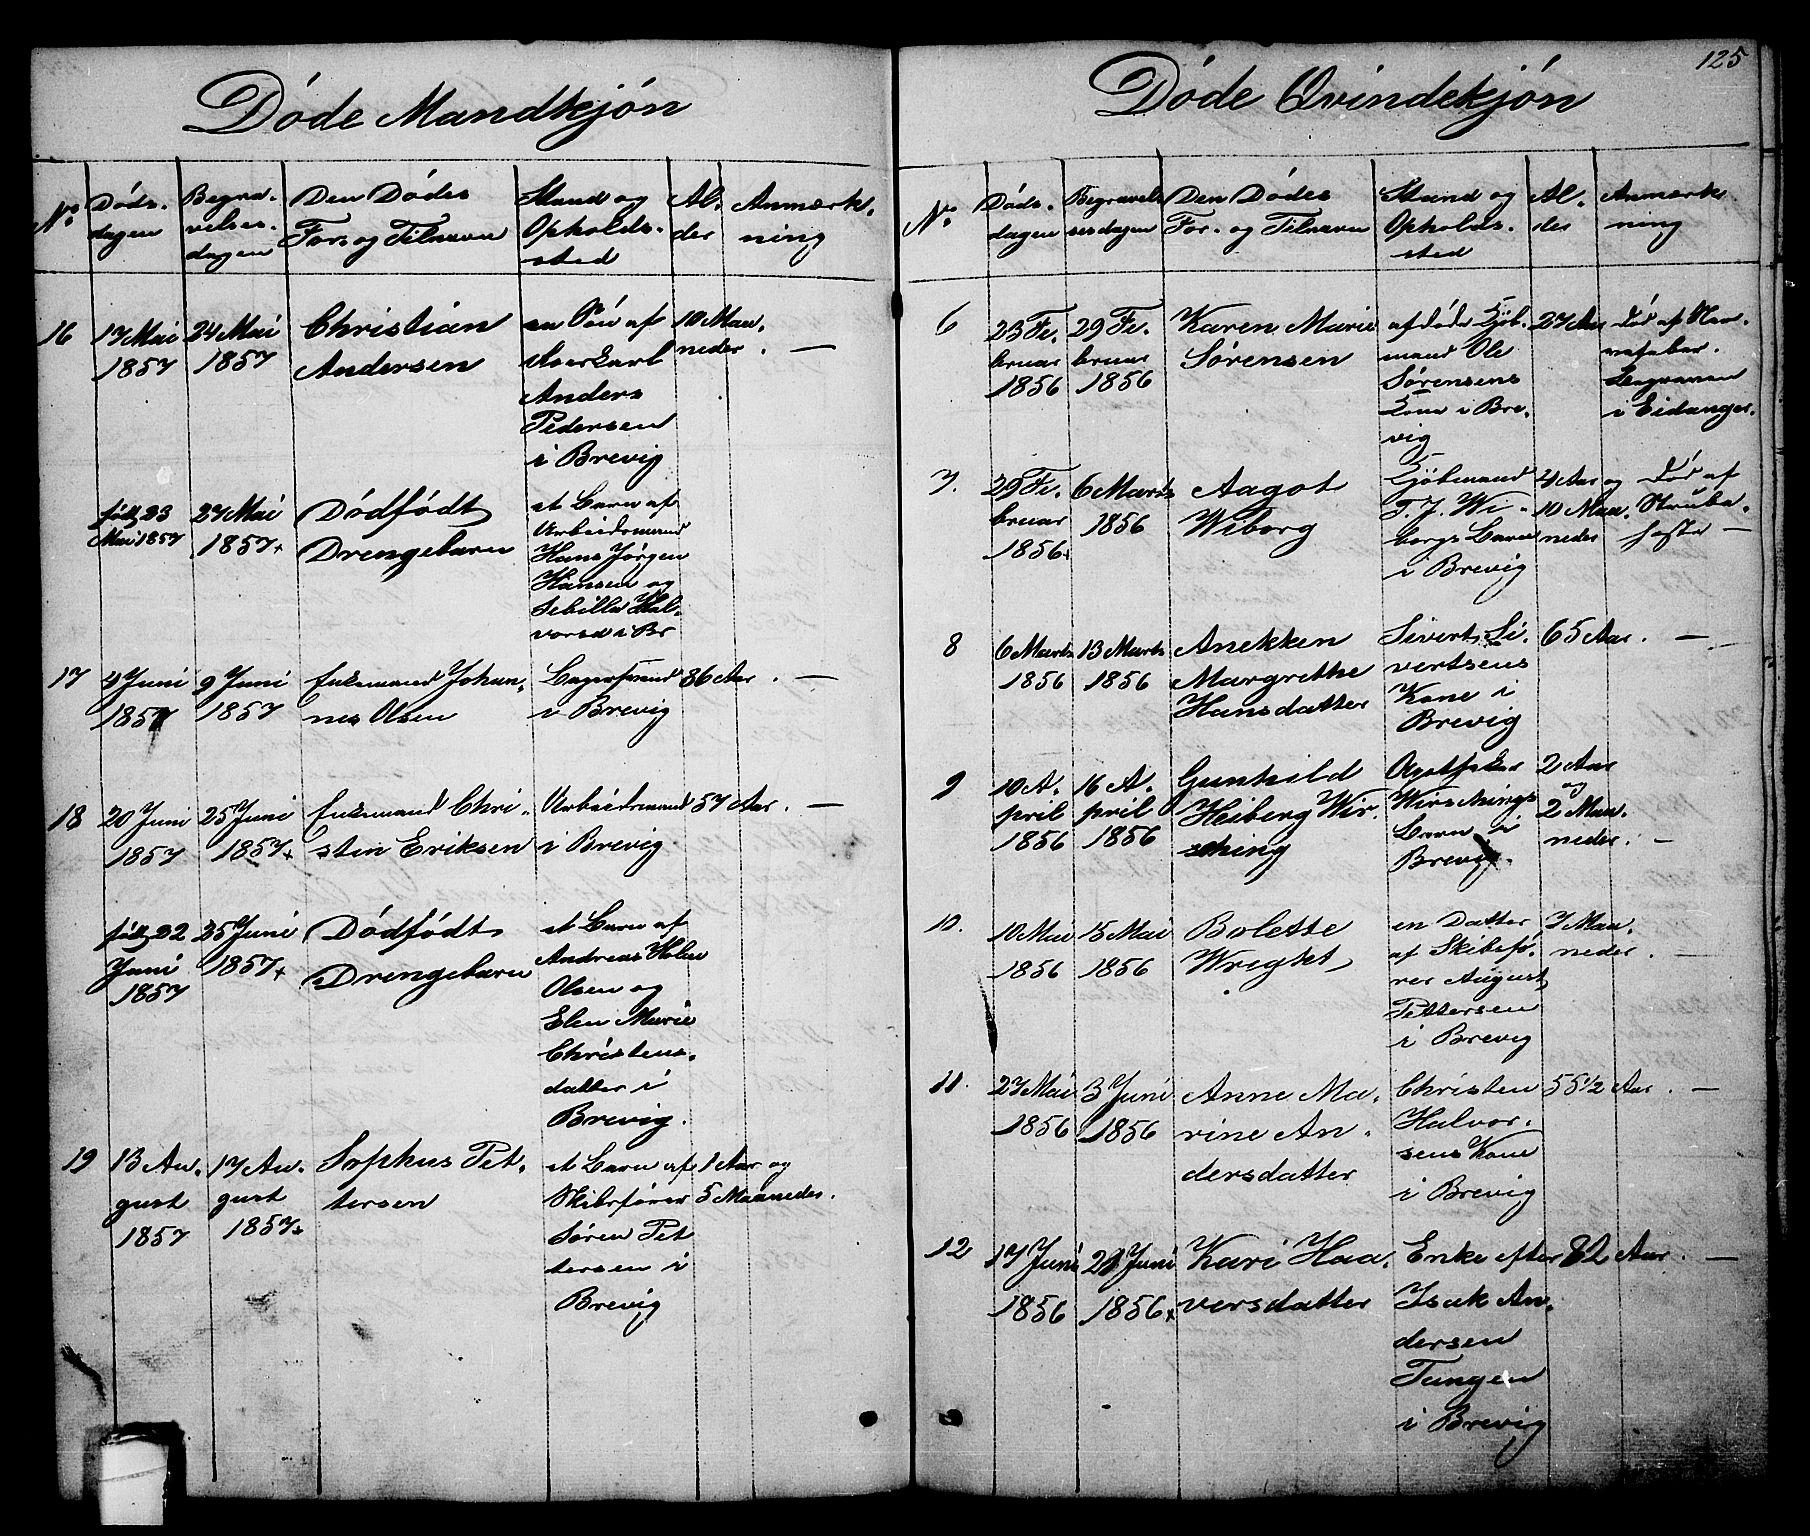 SAKO, Brevik kirkebøker, G/Ga/L0002: Klokkerbok nr. 2, 1846-1865, s. 125